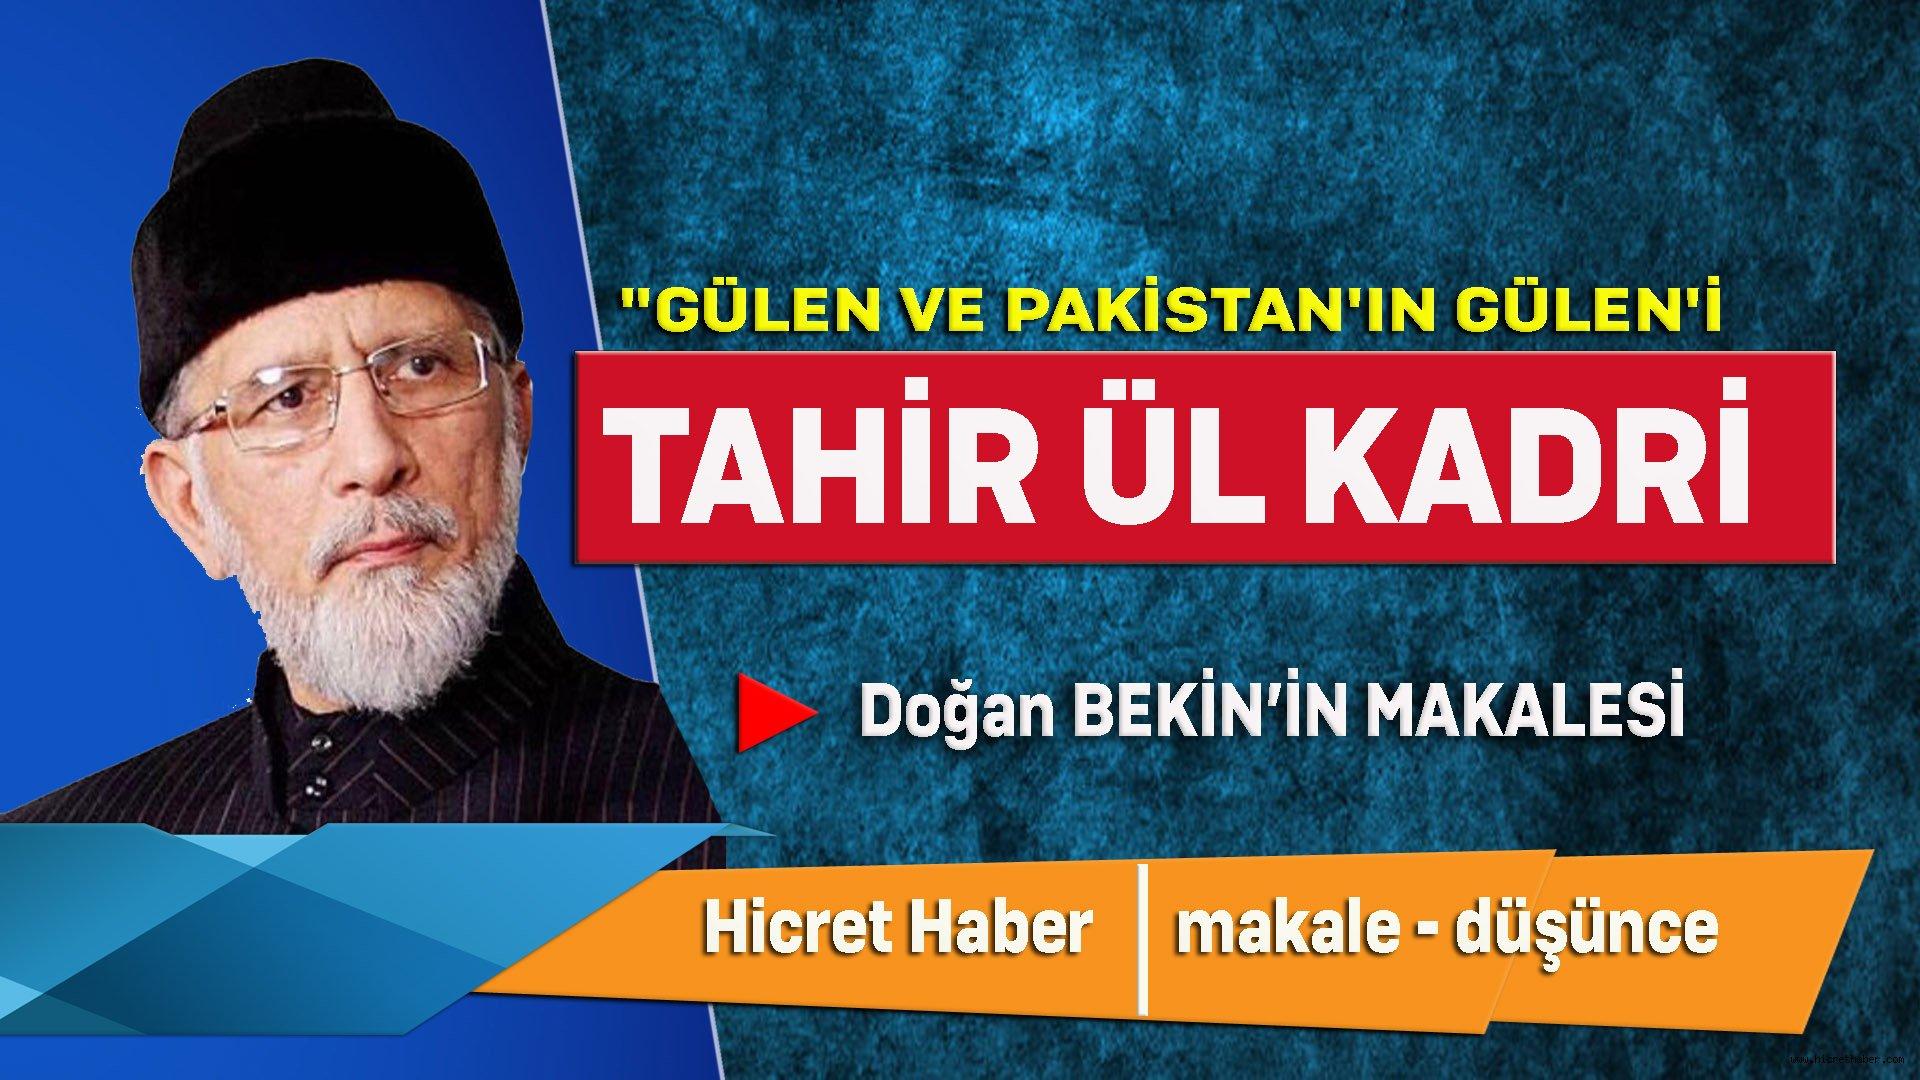 Diyalogçu Gülen Ve Muhammed Tahir-ül Kadri